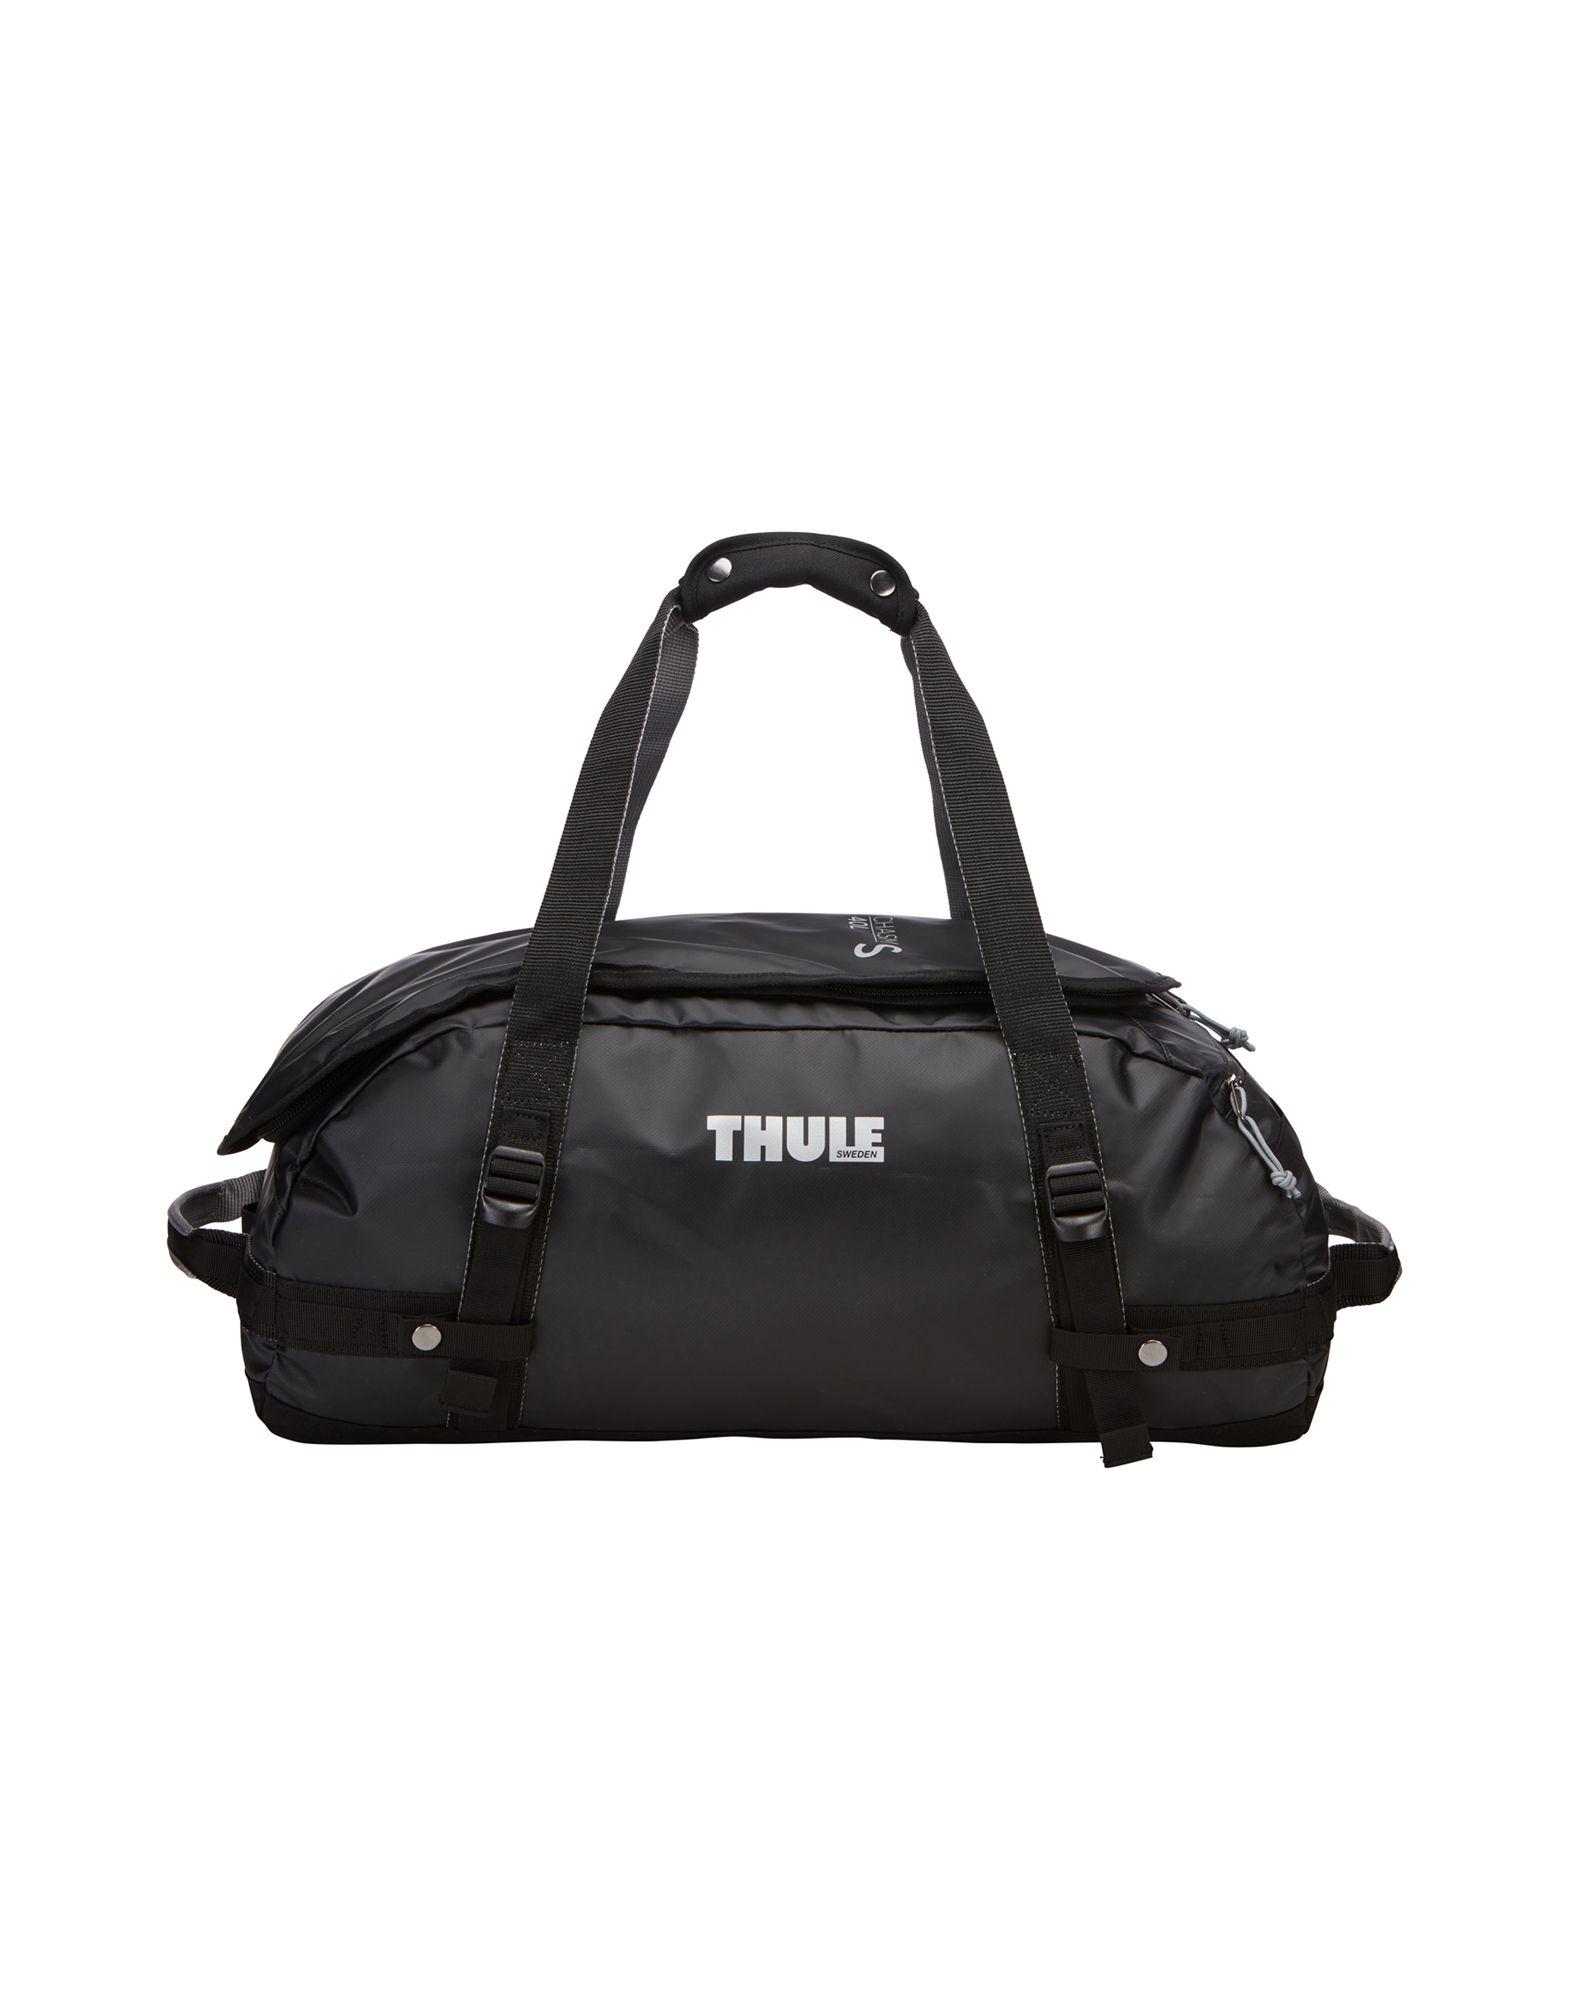 THULE® Дорожная сумка чемоданы thule дорожная сумка на колесах thule crossover